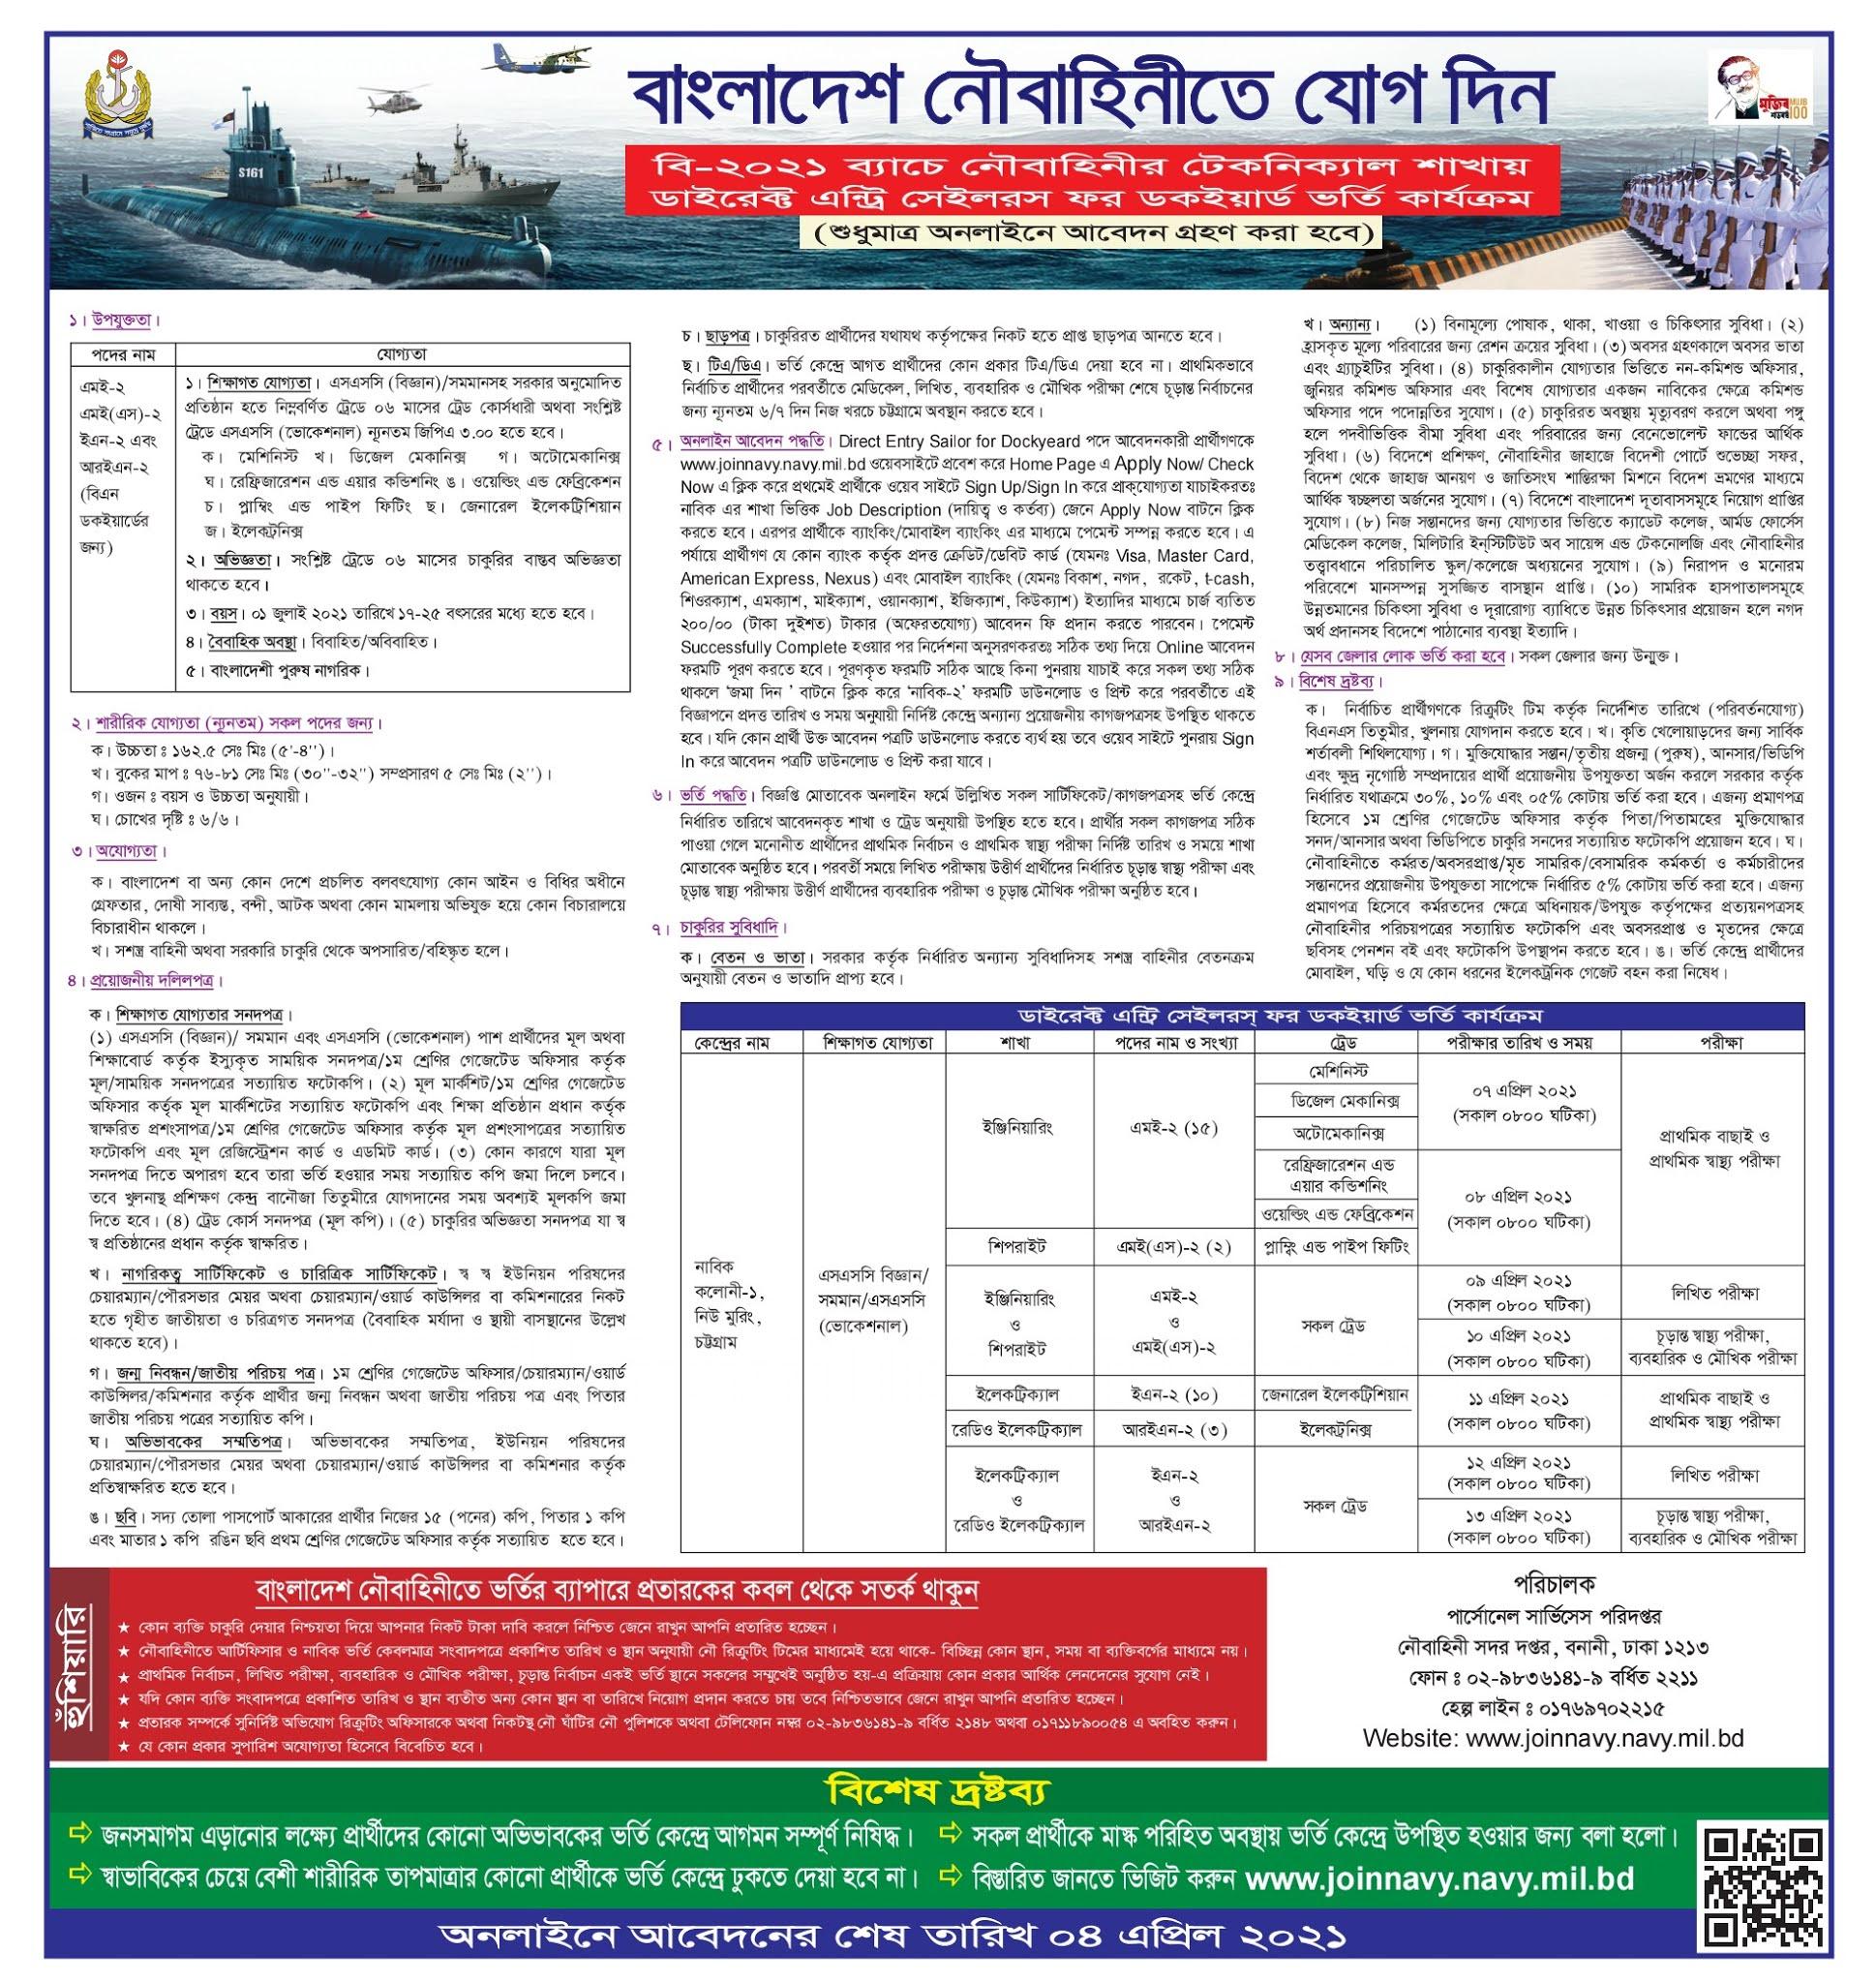 Prothom Alo Weekly Chakrir bakri - Job Newspaper 19 March 2021 - প্রথম আলো চাকরির খবর-চাকরি বাকরি ১৯ মার্চ ২০২১